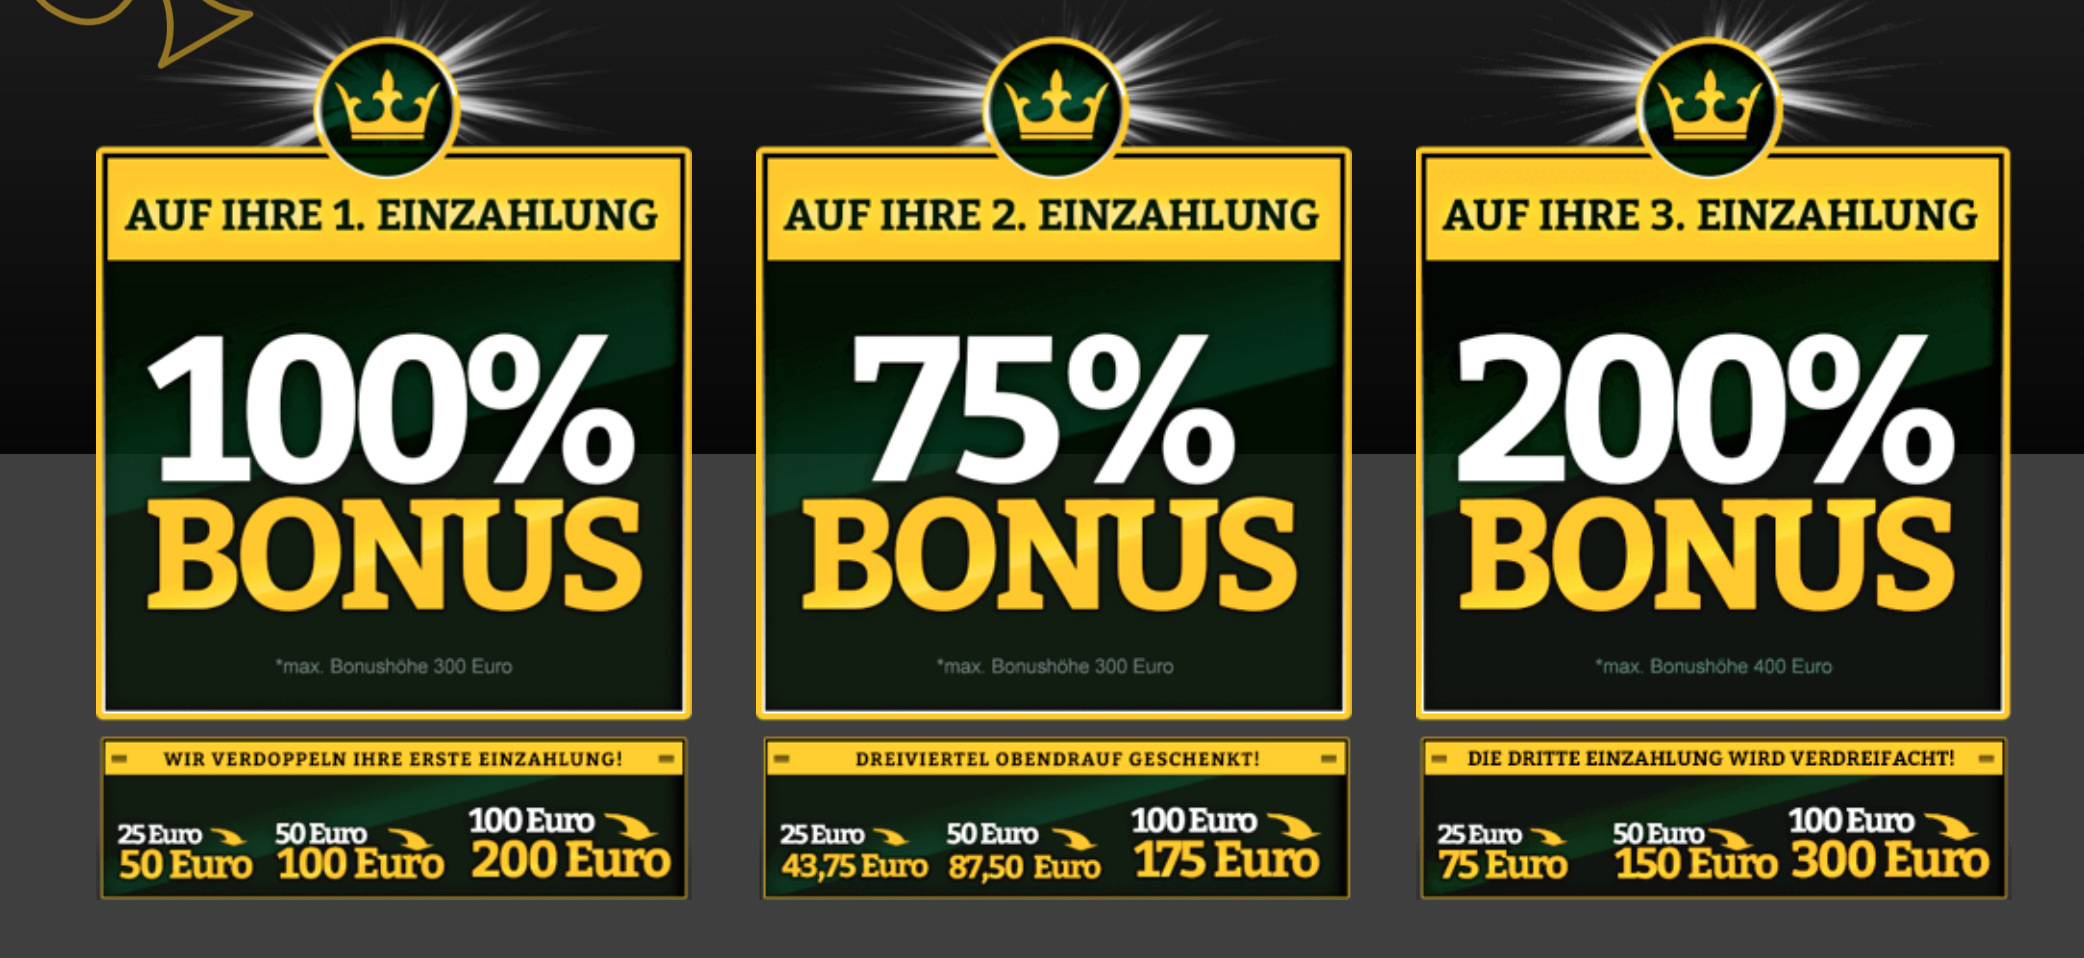 Bonus-Onlinecasino